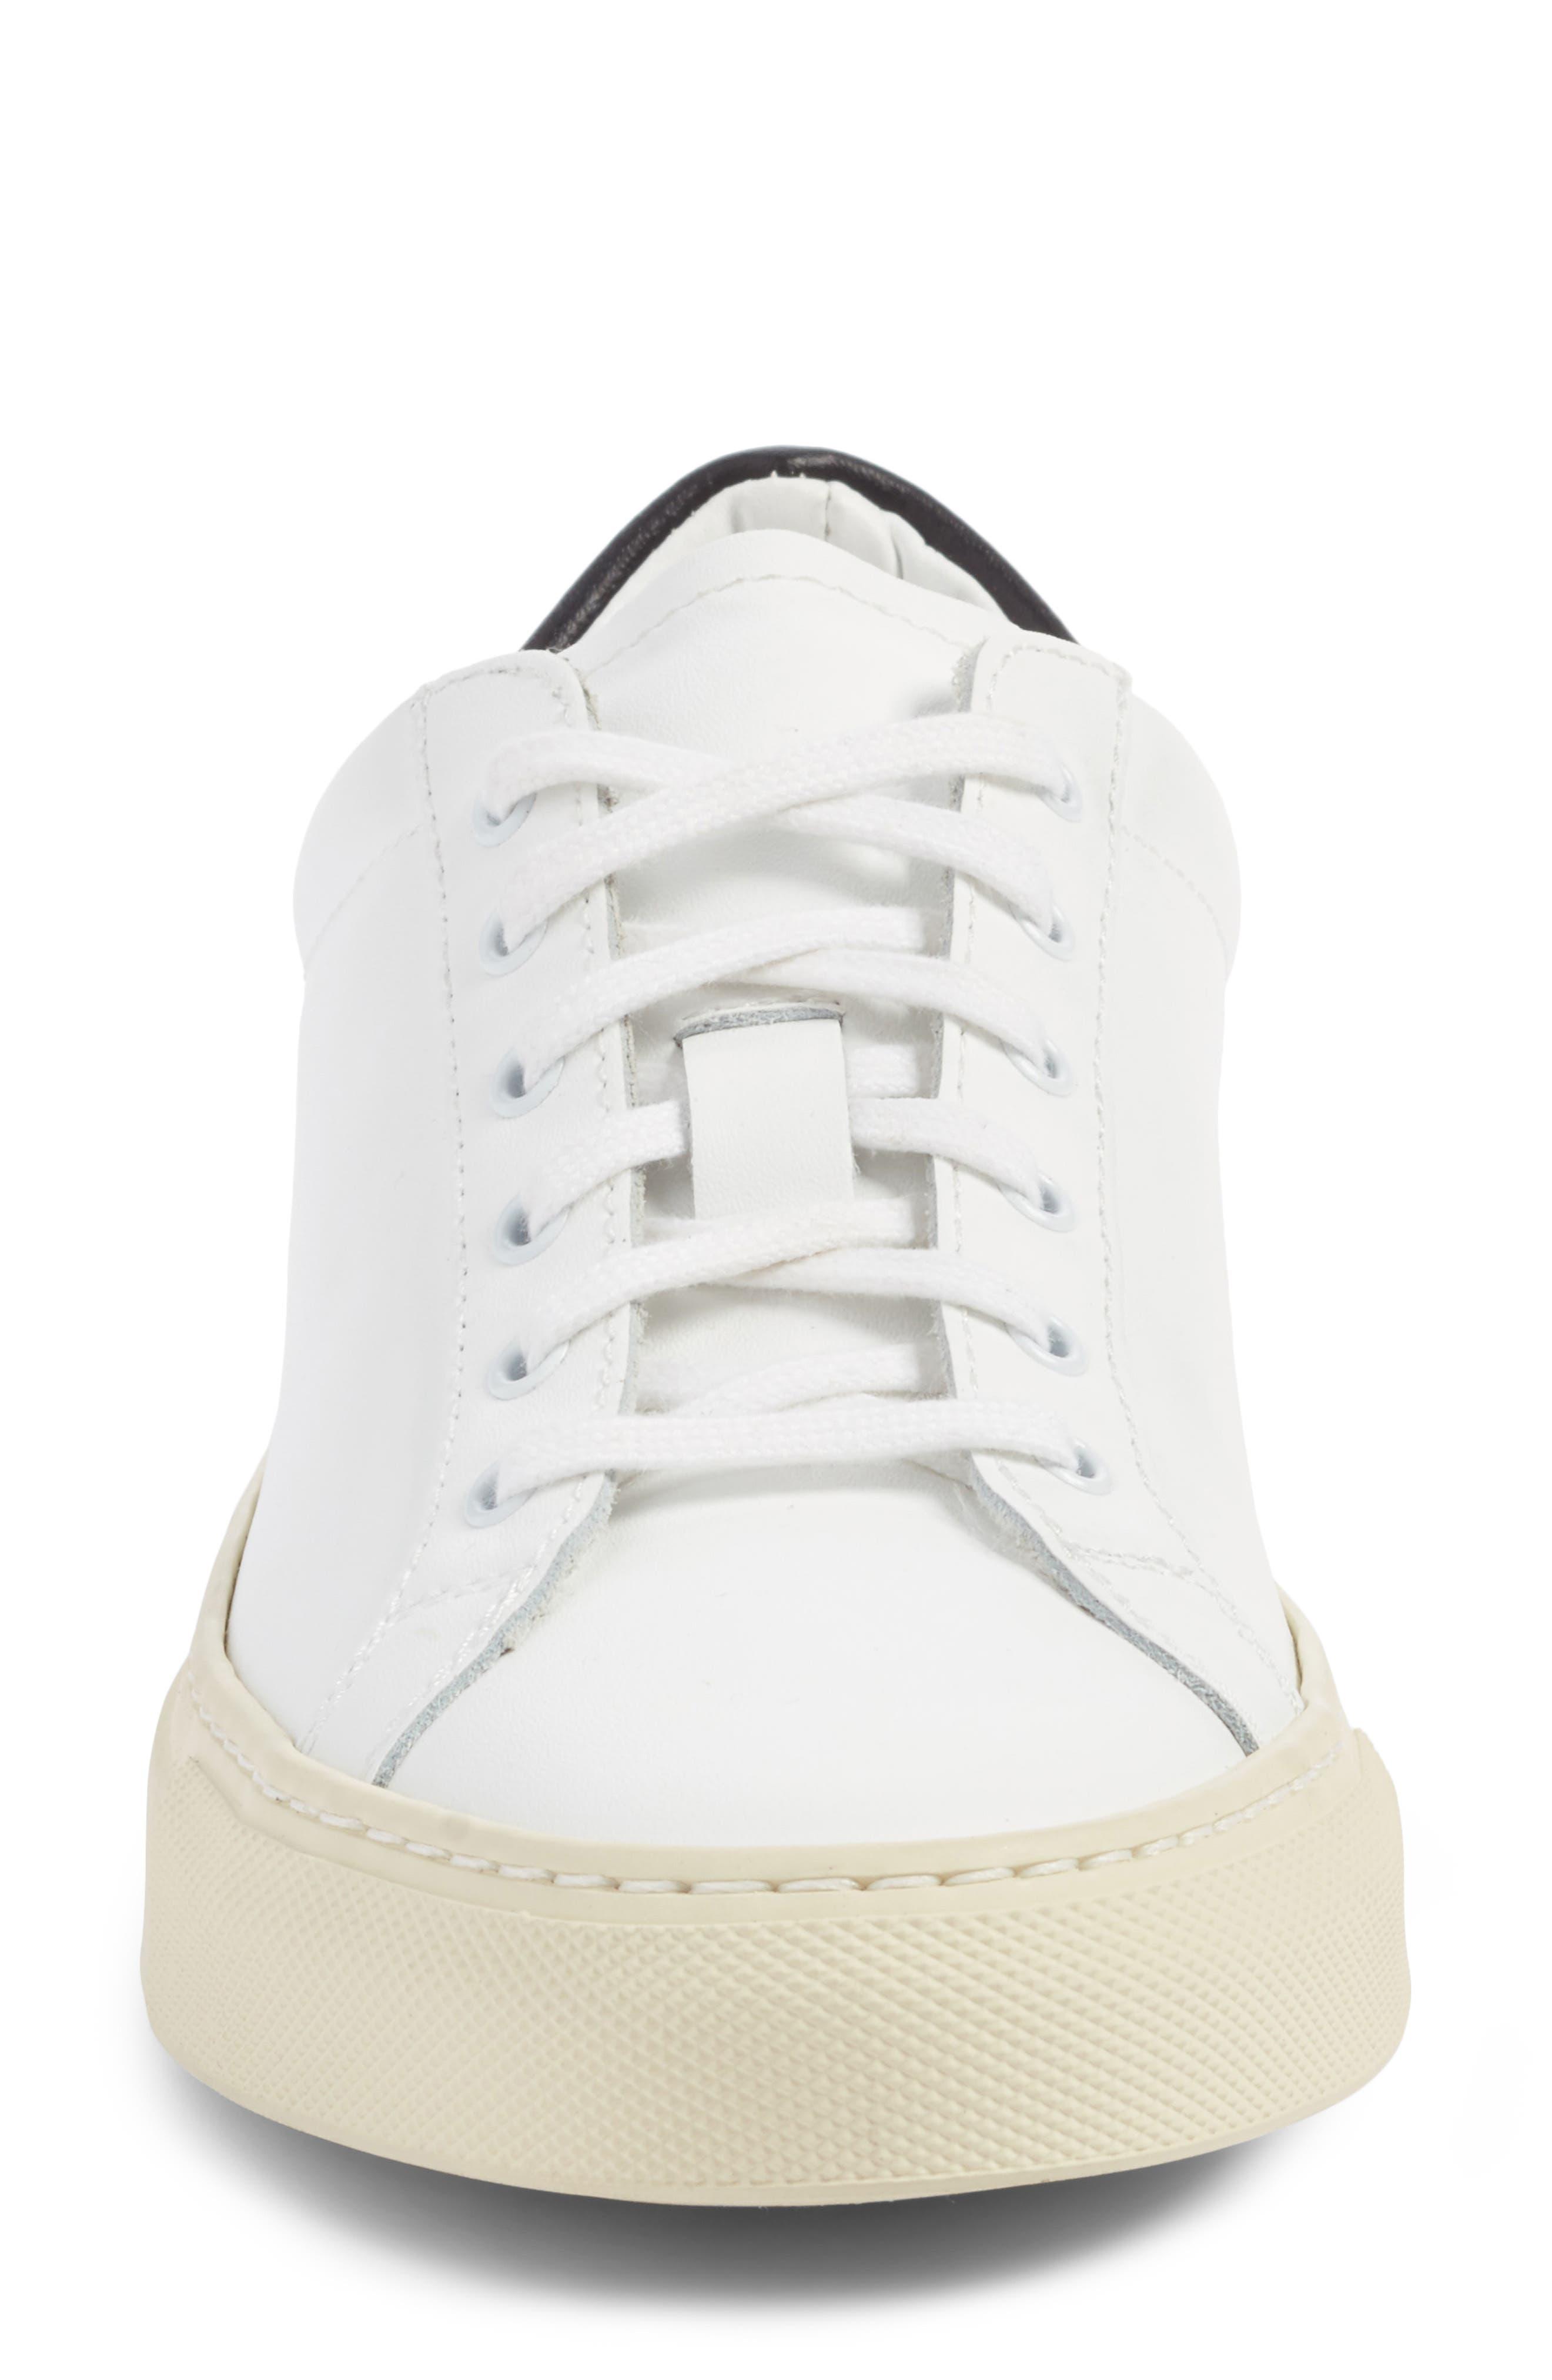 Achilles Low Top Sneaker,                             Alternate thumbnail 4, color,                             White/ Black